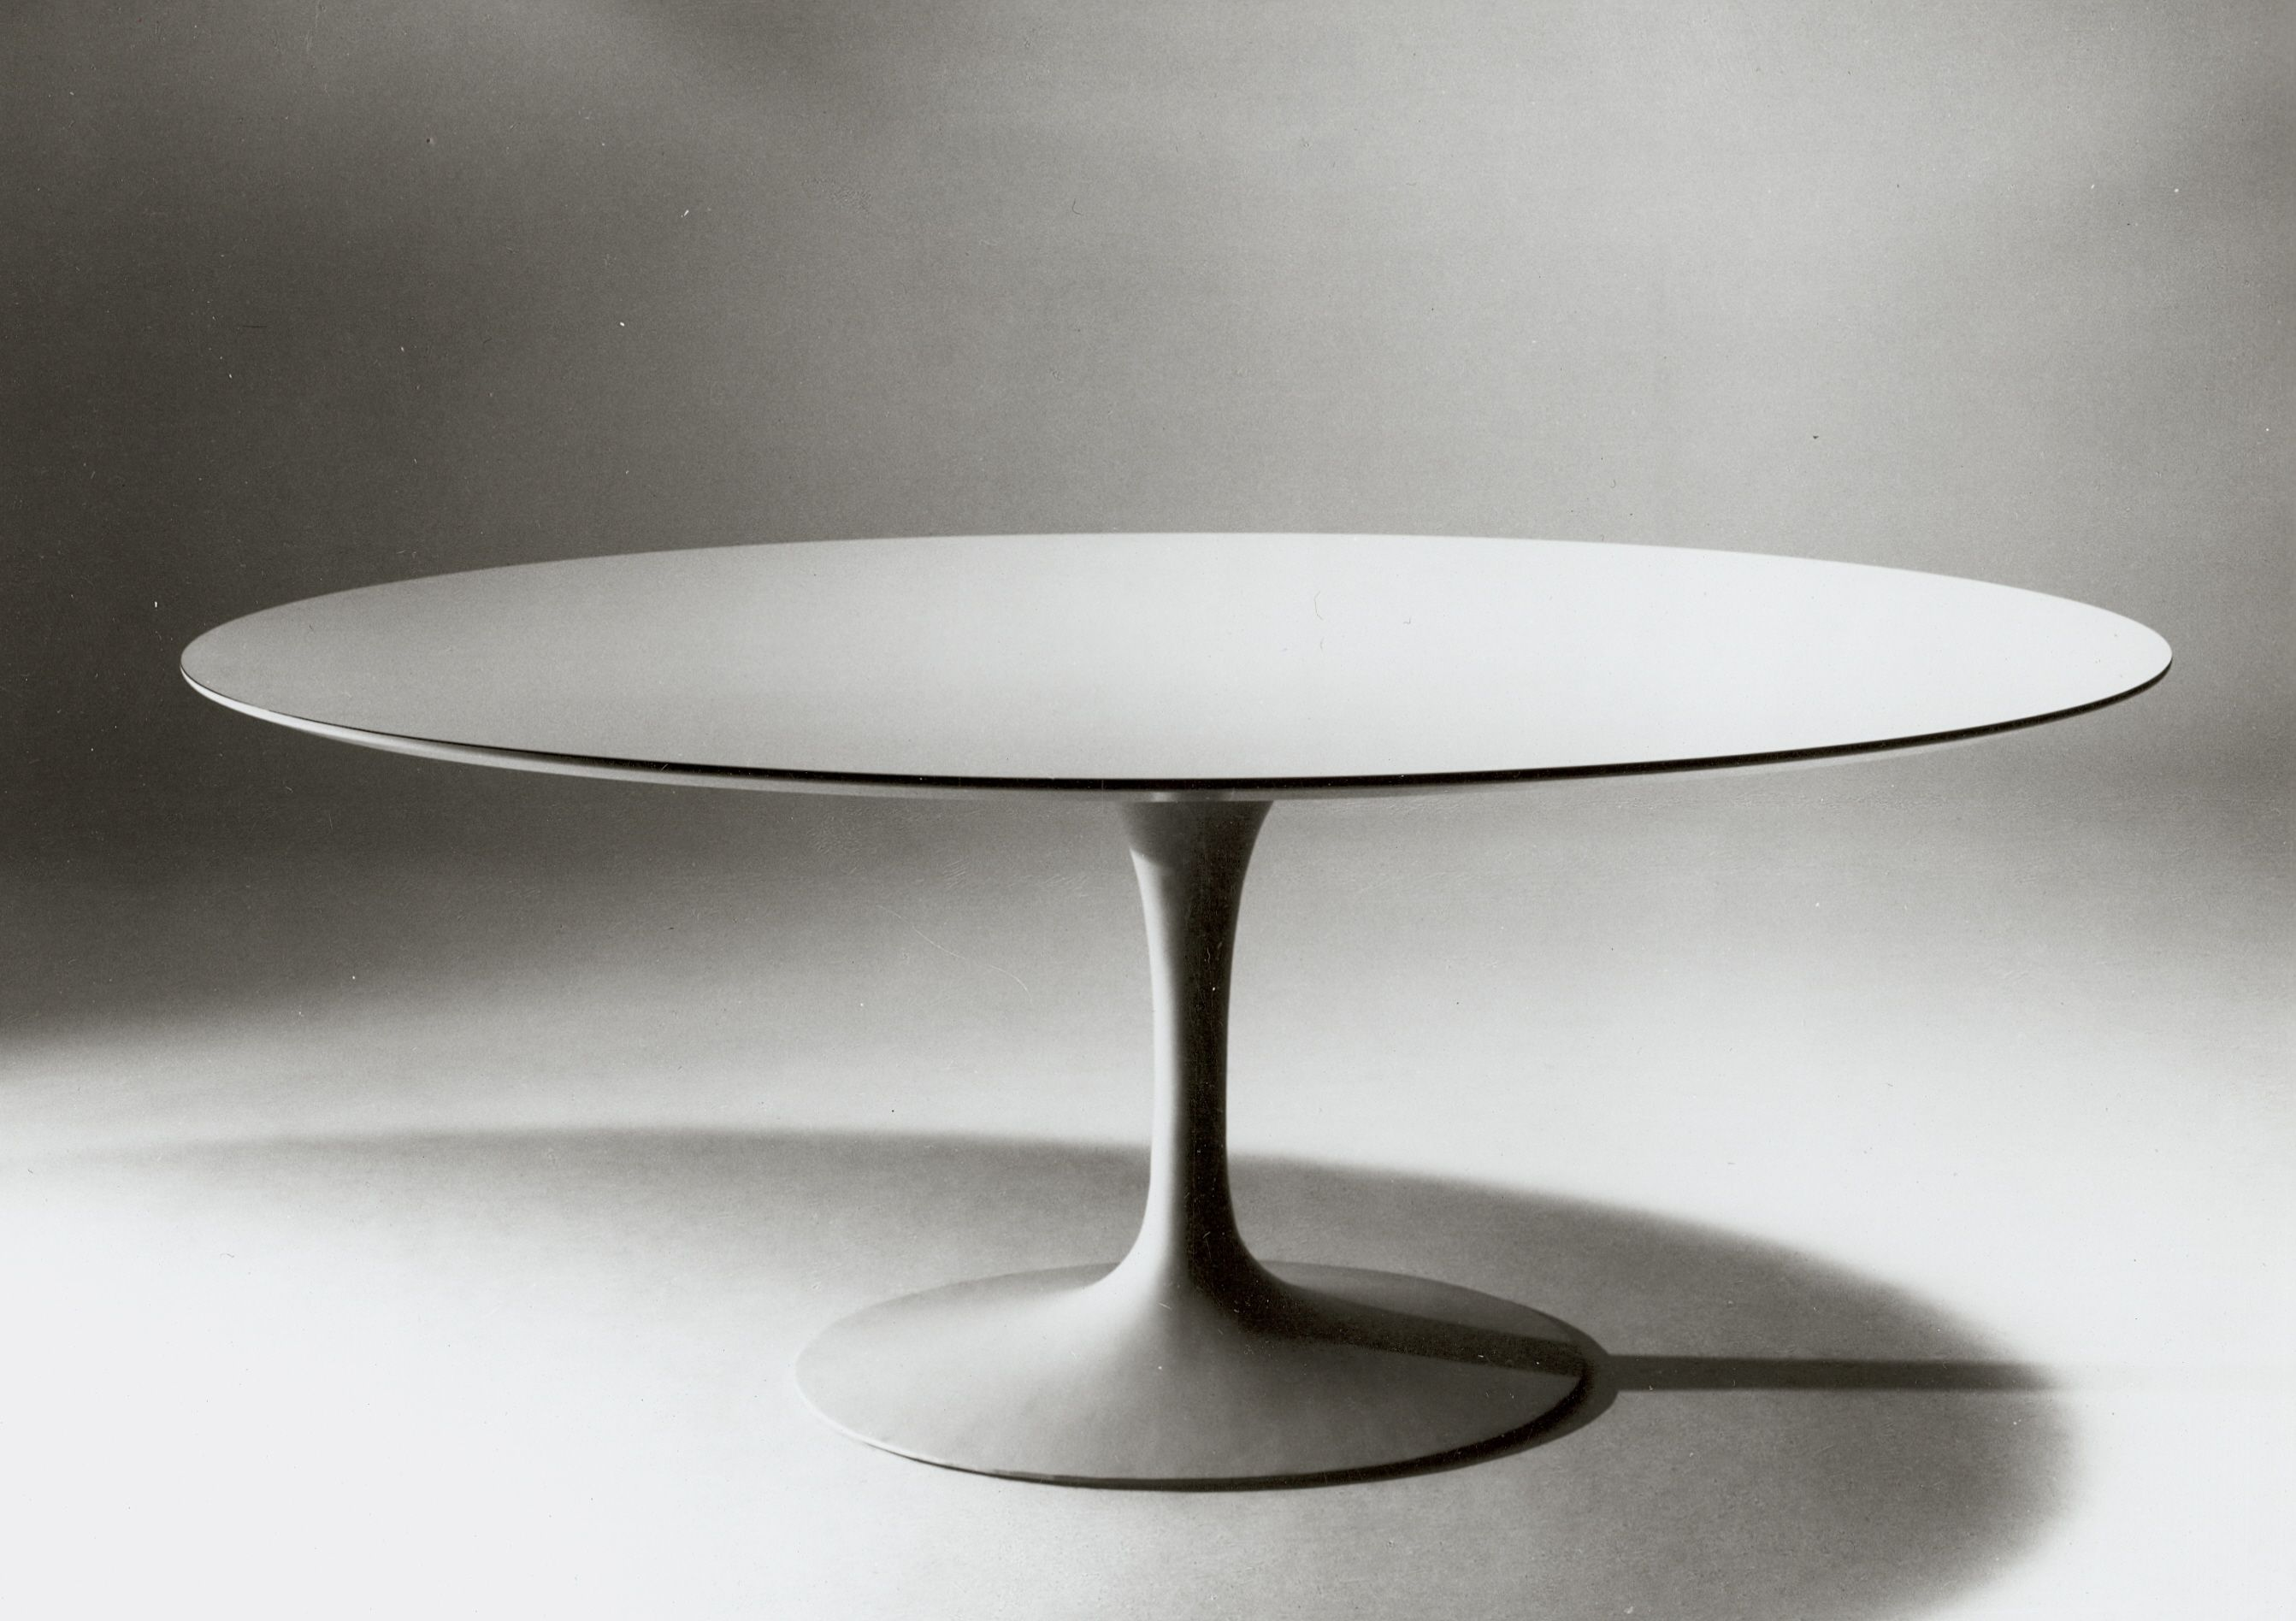 knoll saarinen table redesign lefferts gardens pinterest